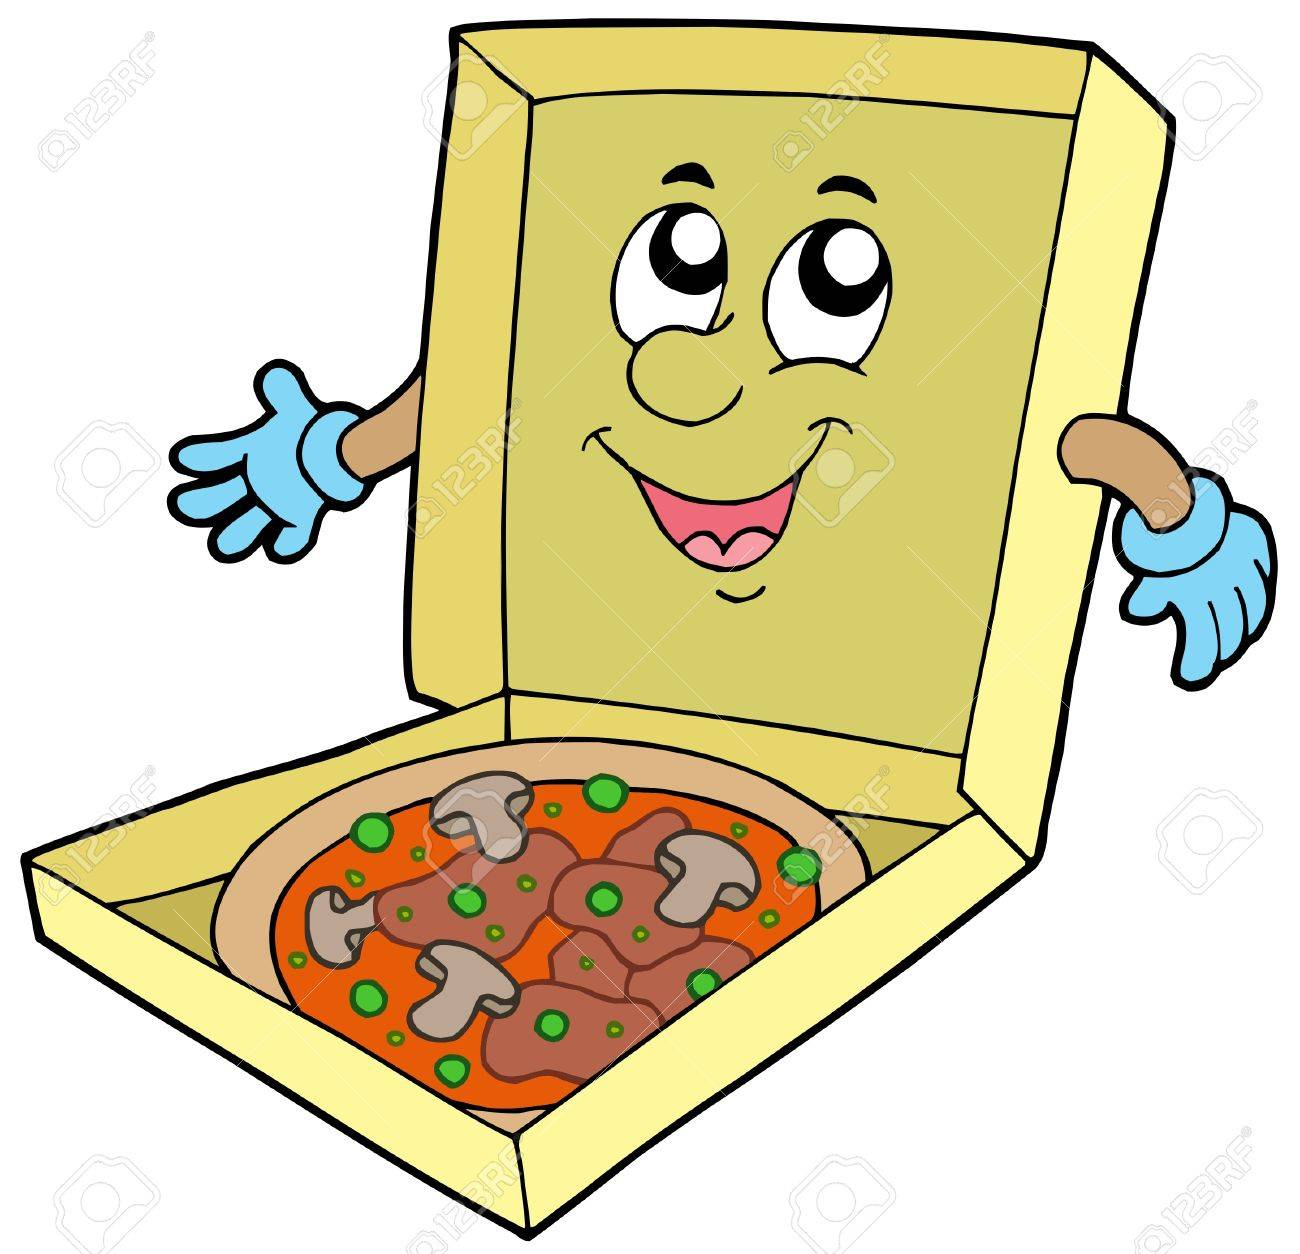 Cartoon pizza box - vector illustration. Stock Vector - 5384558